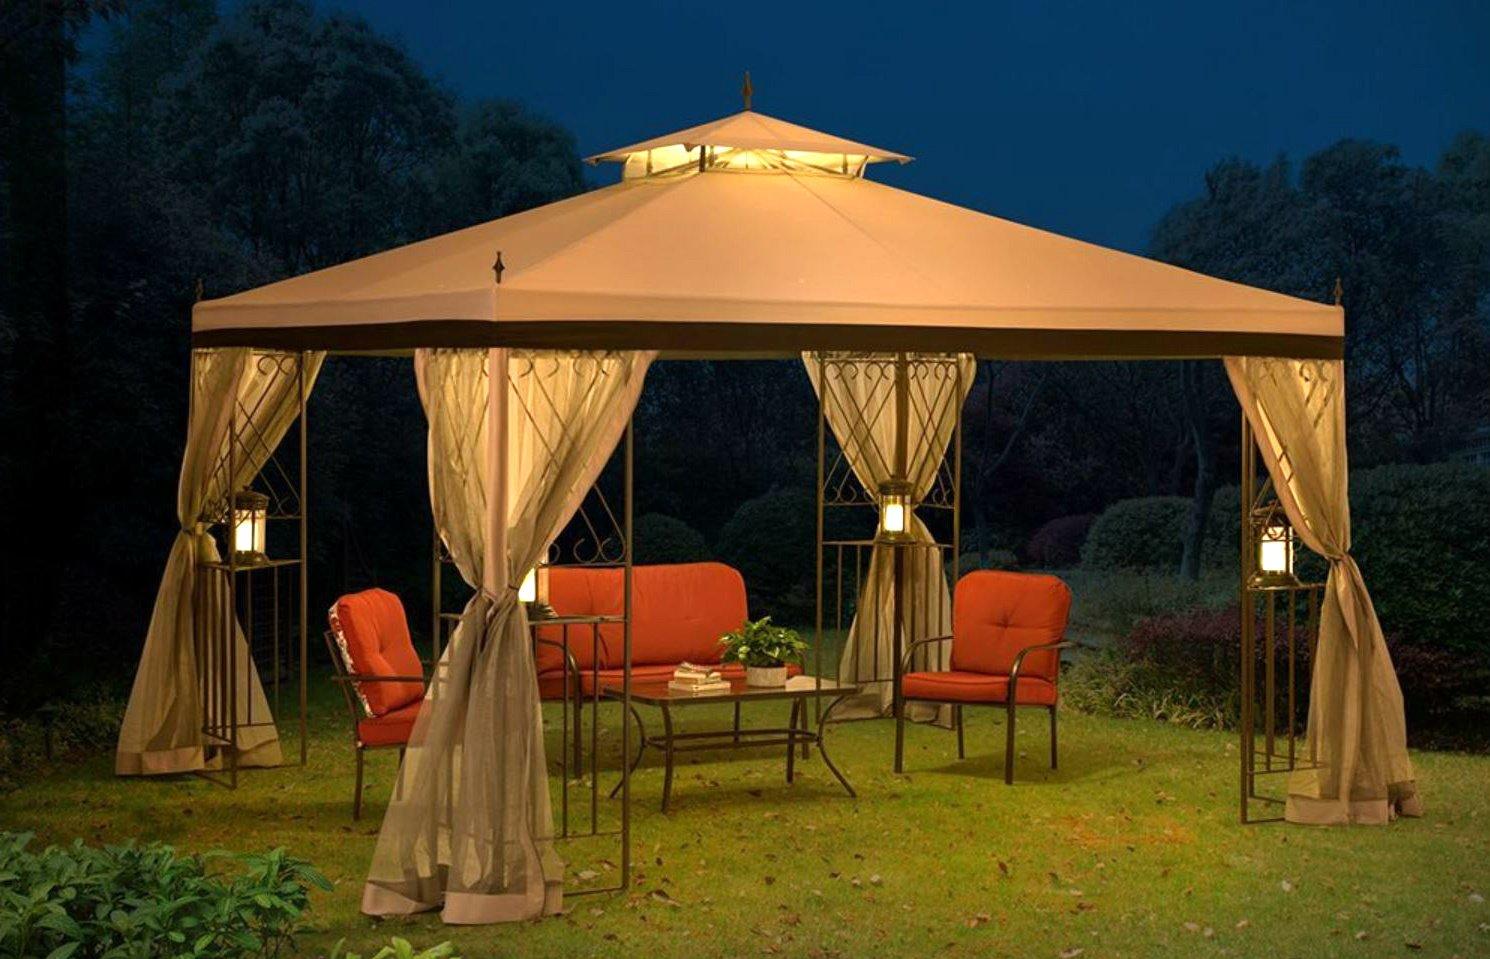 10x12 Gazebo Canopy Outdoor Patio Garden Backyard Dining Pergola Steel Frame Soft Top with Netting by PatioJoy